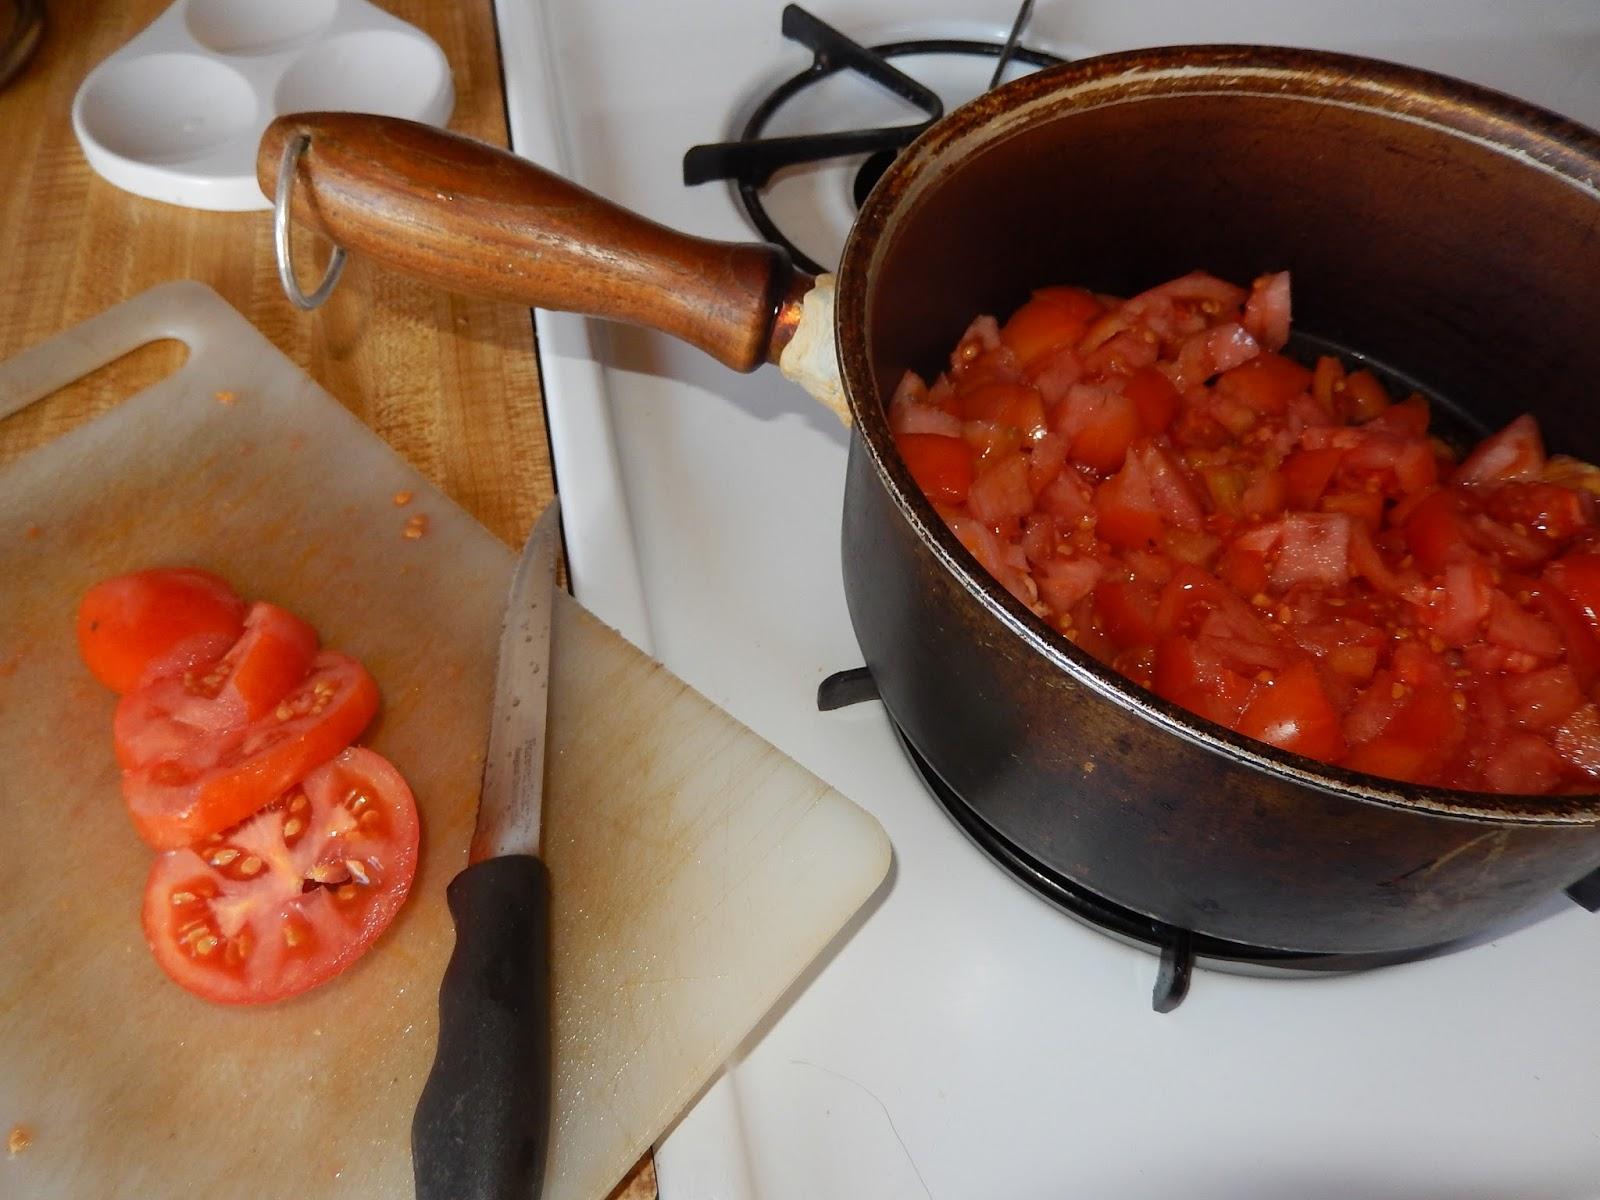 ... Lutz's Blog - Simple Freezer Tomato Sauce - October 08, 2015 09:30